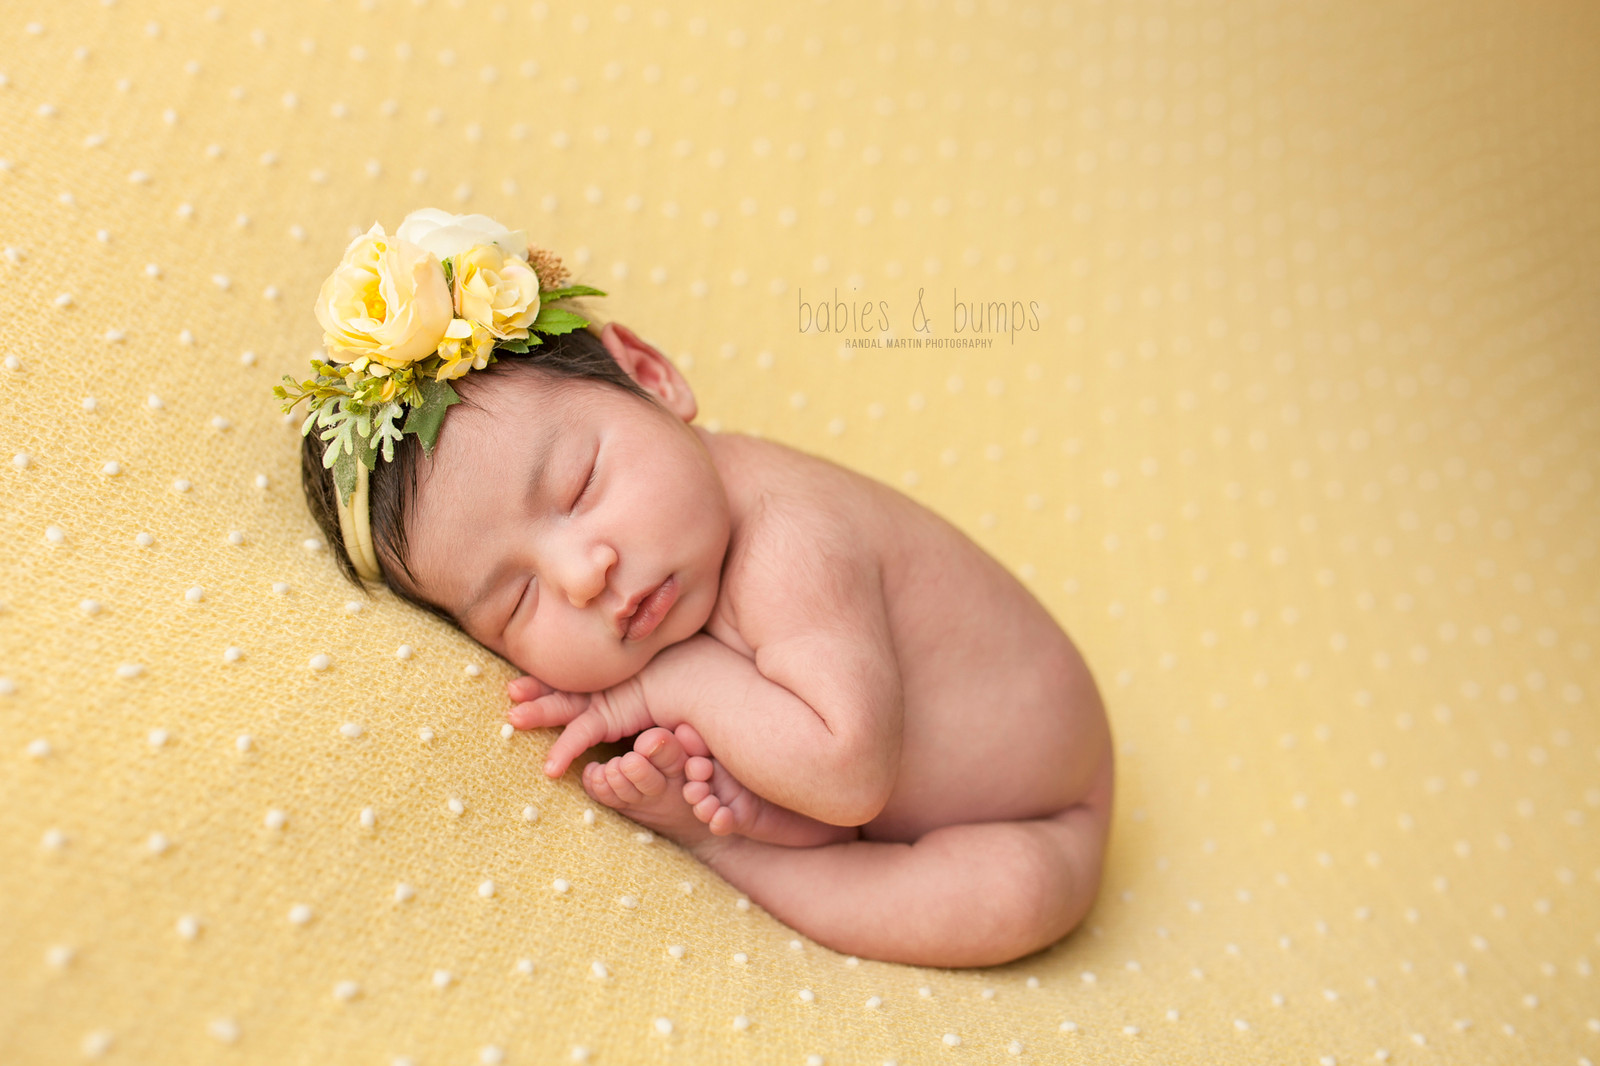 yellow bumps on newborn skin